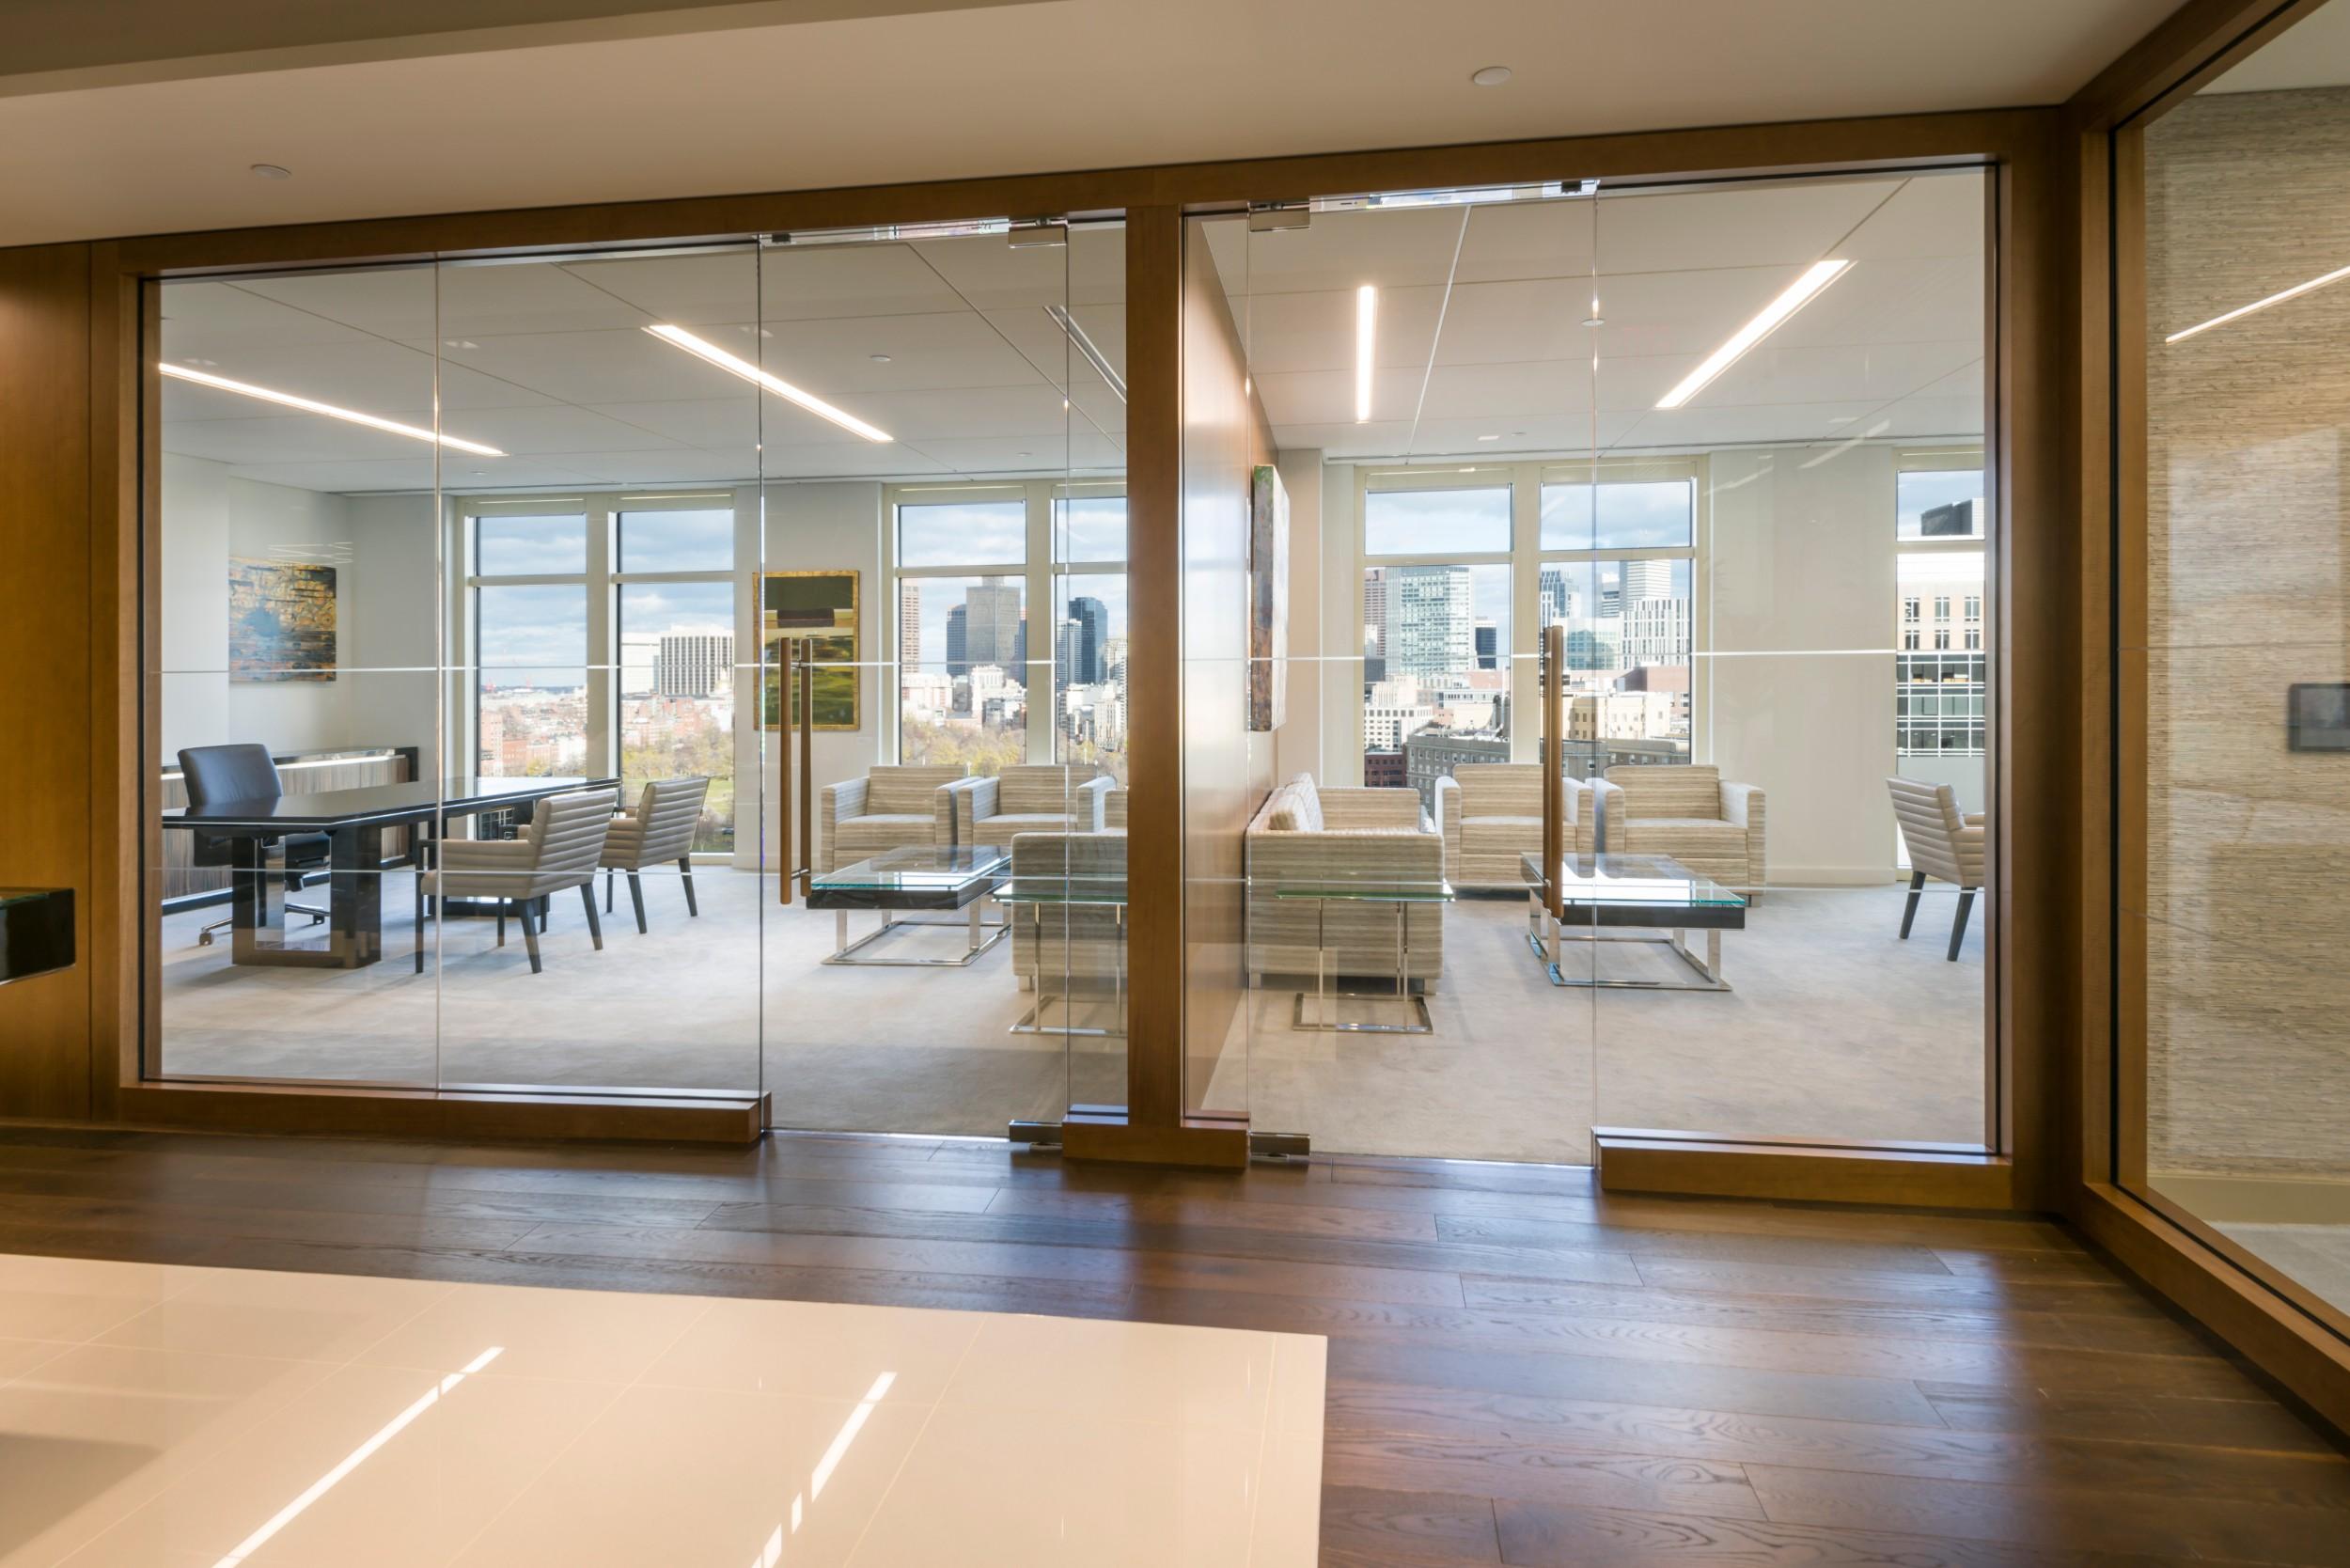 Corderman_Construction_Martignetti_Companies_Interior_Office_Buildout_Exterior_Office_View.jpg